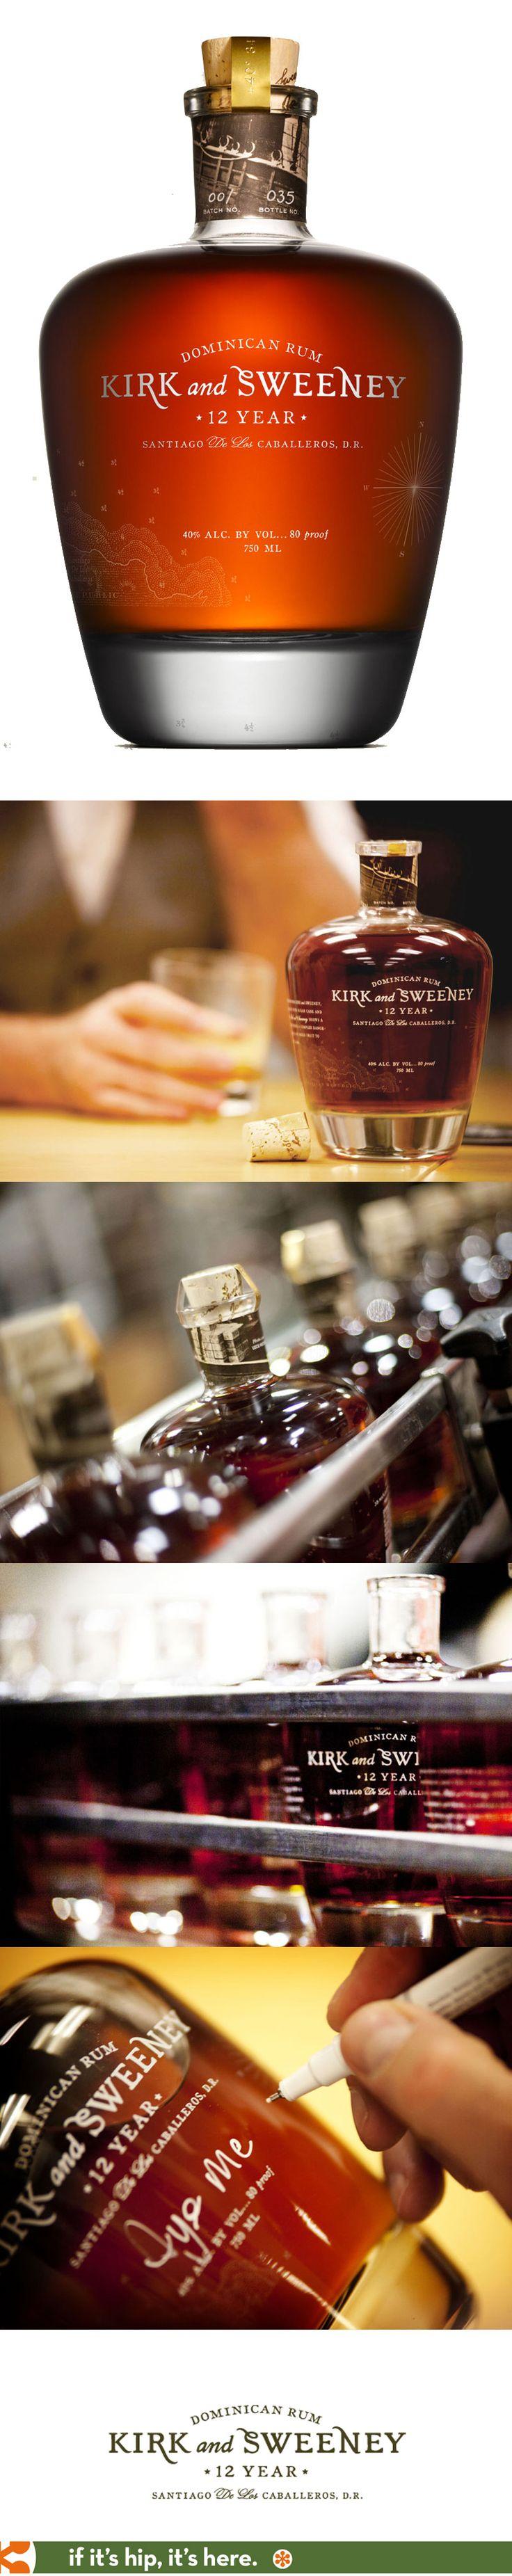 Kirk & Sweeney 12 year Dominican Rum Bottle